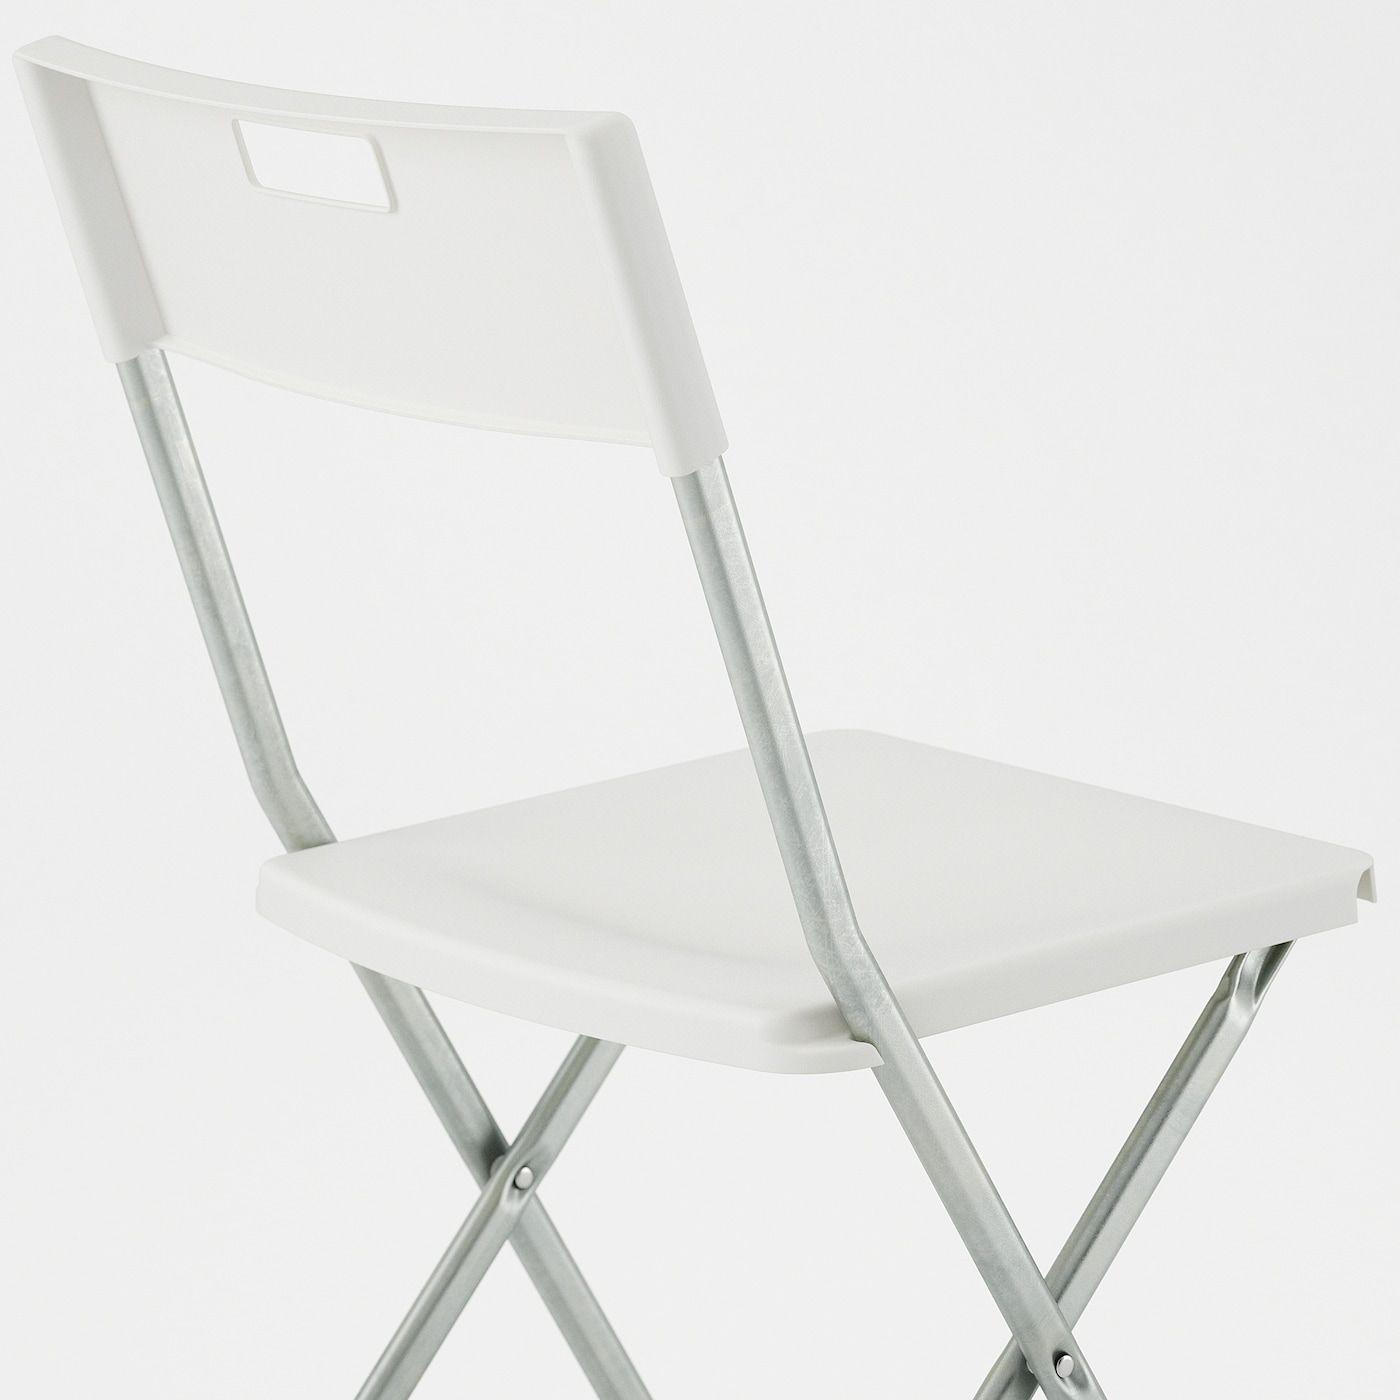 Gunde Folding Chair White In 2020 Folding Chair Chair Ikea